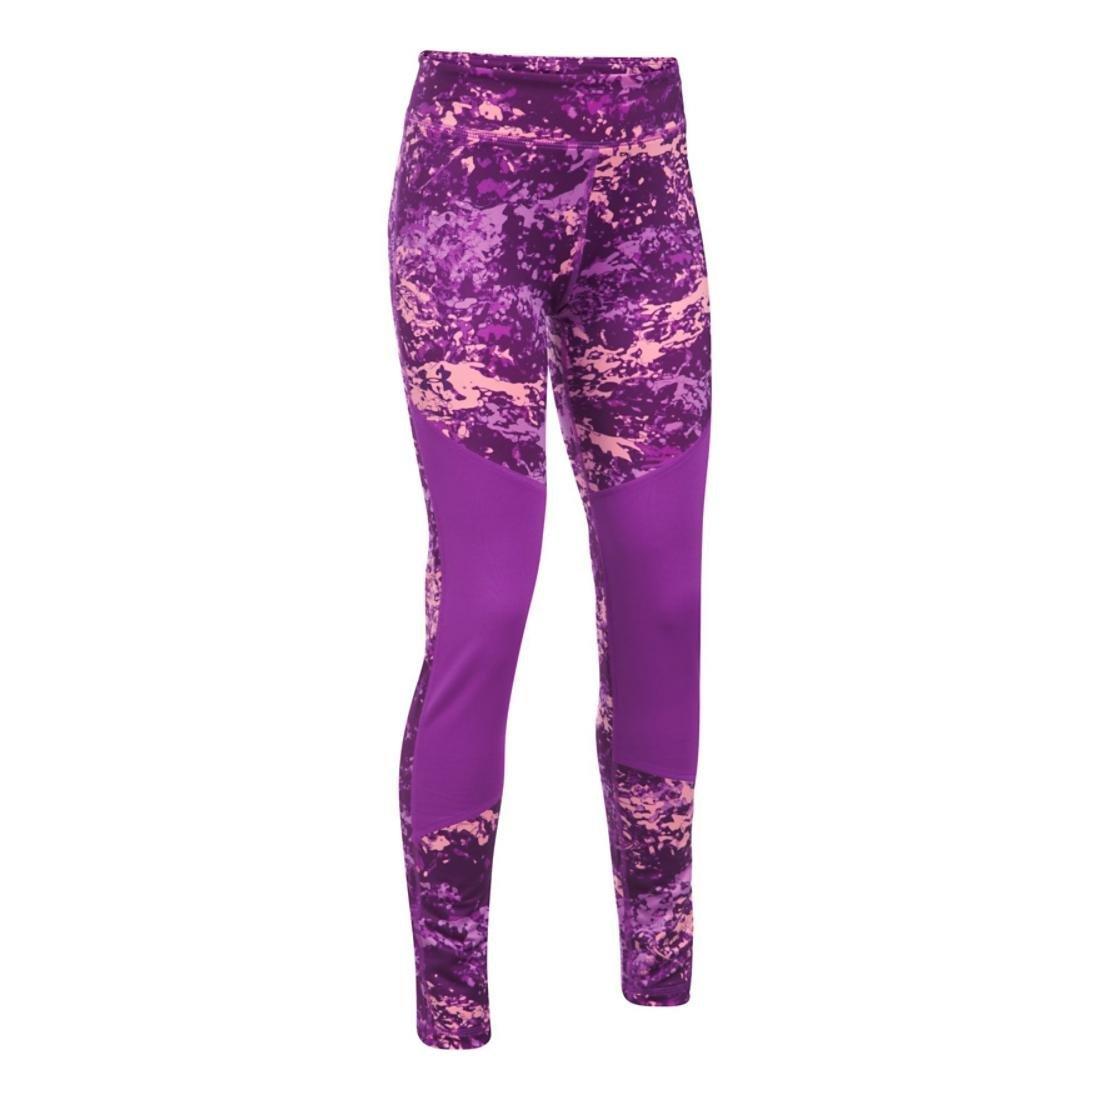 Under Armour Girls' ColdGear Novelty Leggings,Purple Rave (959)/Indulge, Youth Large